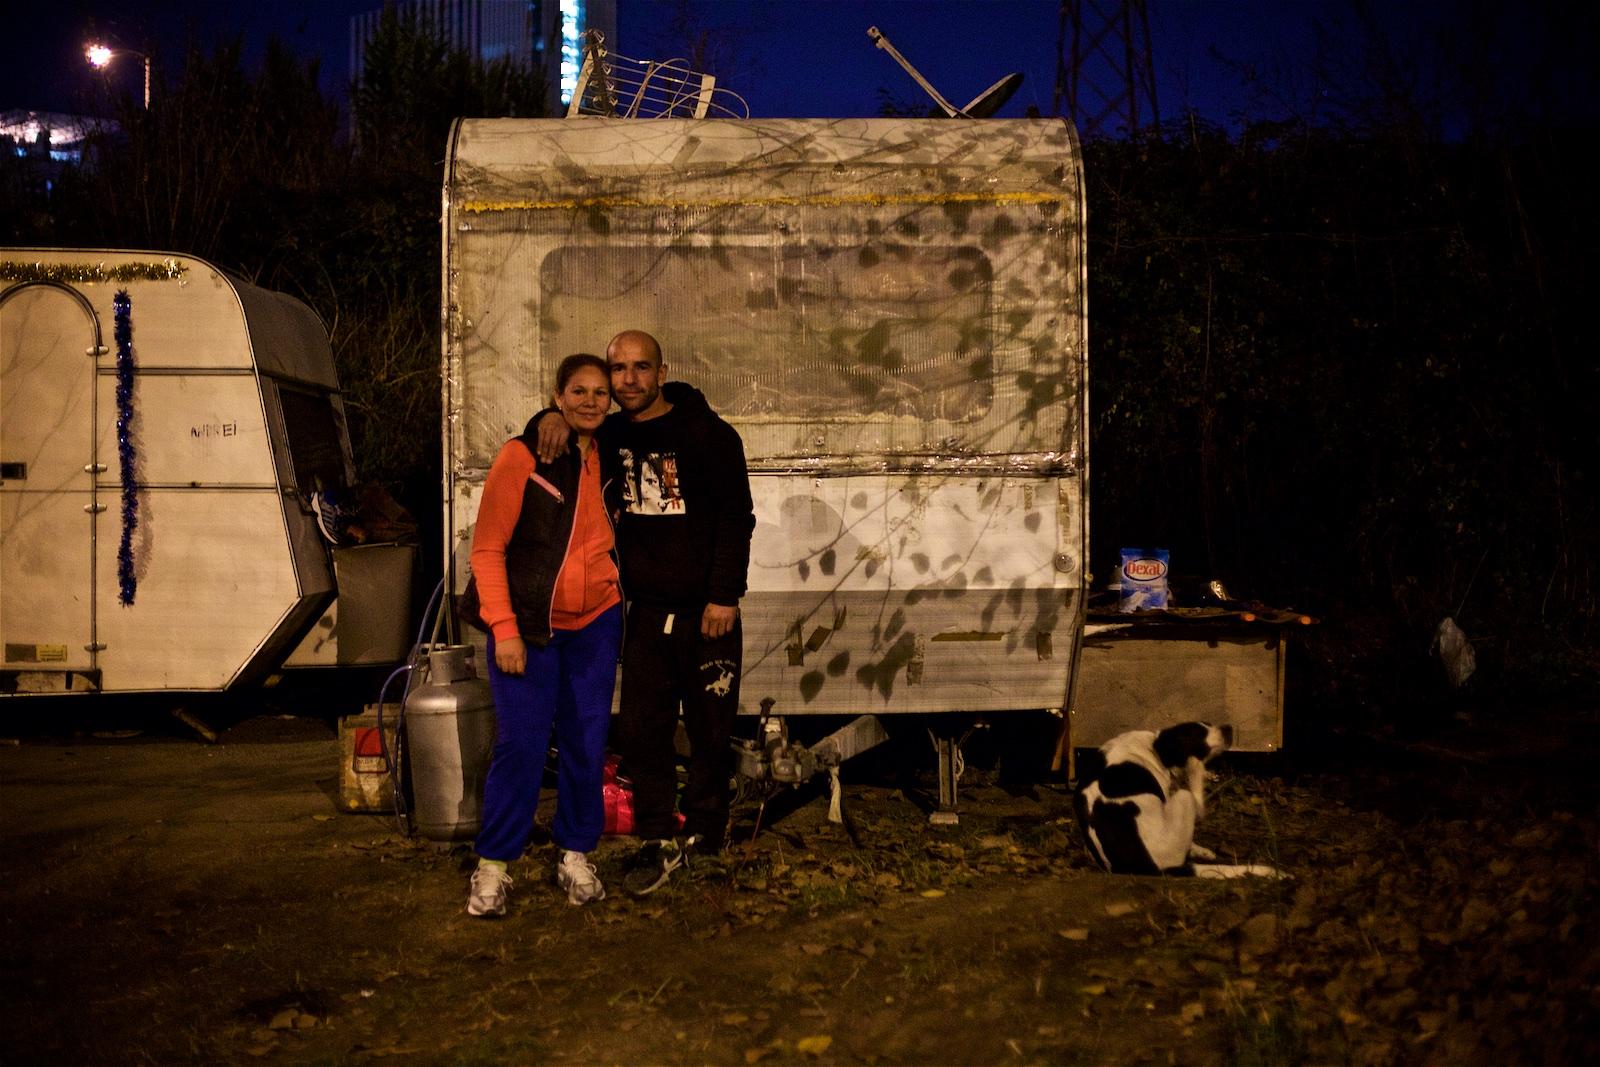 denis-bosnic-apolidia-apolide-stateless-statelessness-cir-01. elena-ramadan-2.jpg